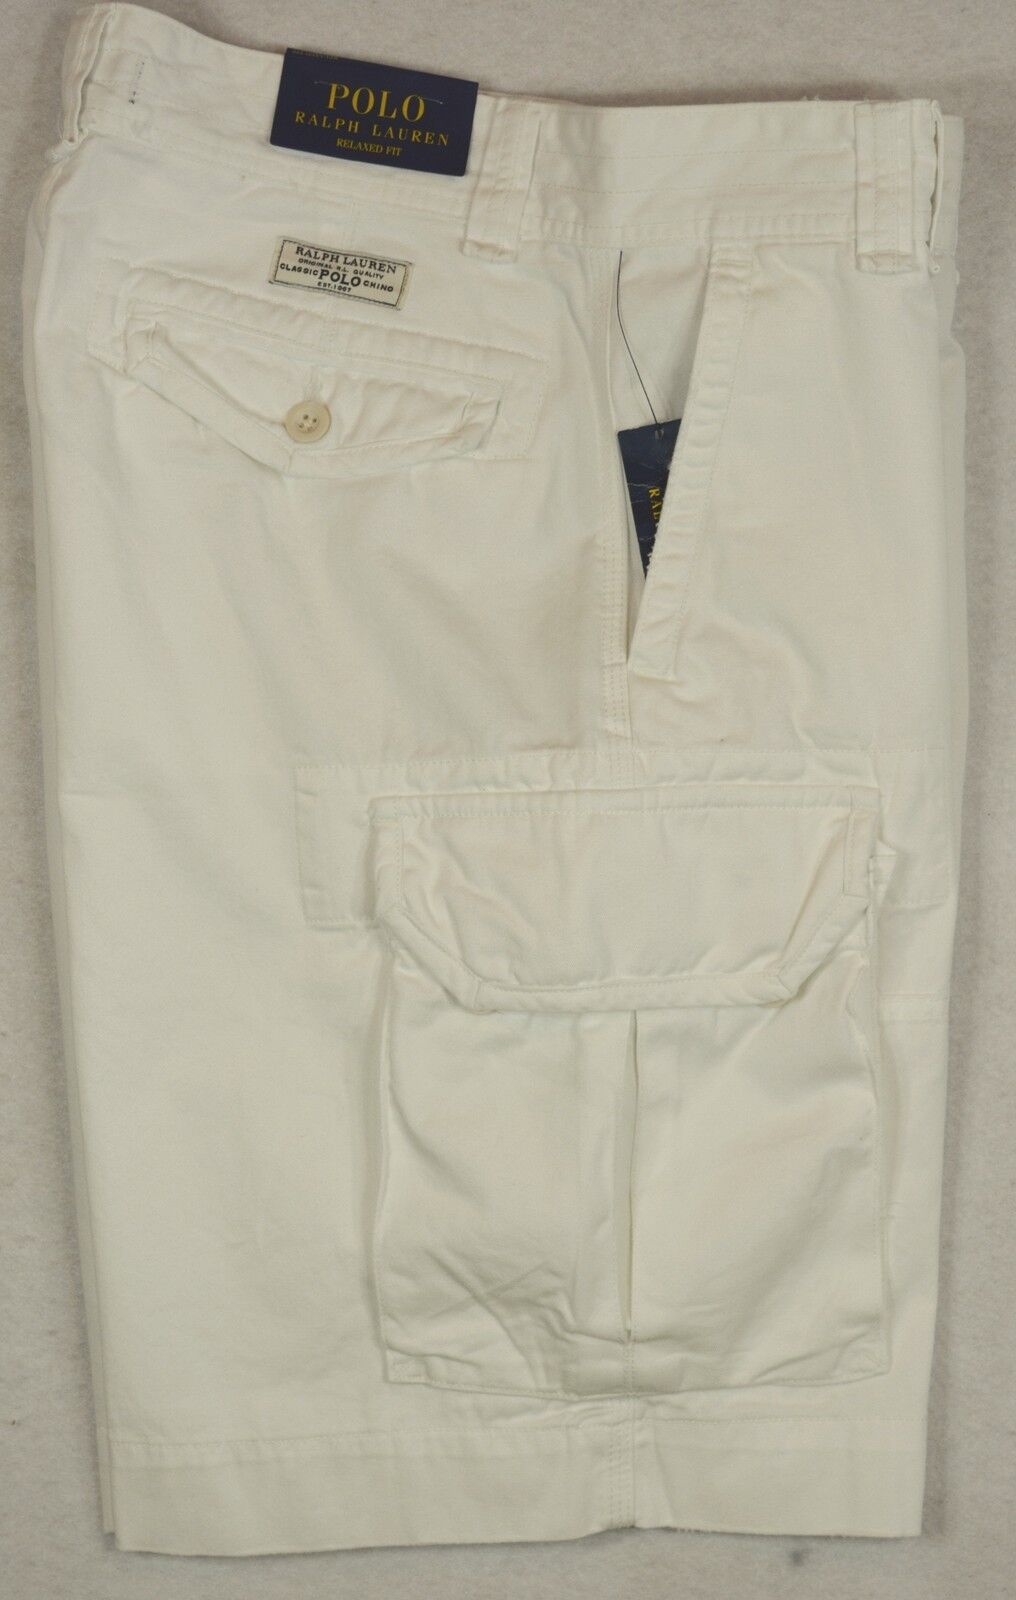 Polo Ralph Lauren Cargos Relaxed Fit Gellar Fatigue Cargo Shorts White 31 NWT